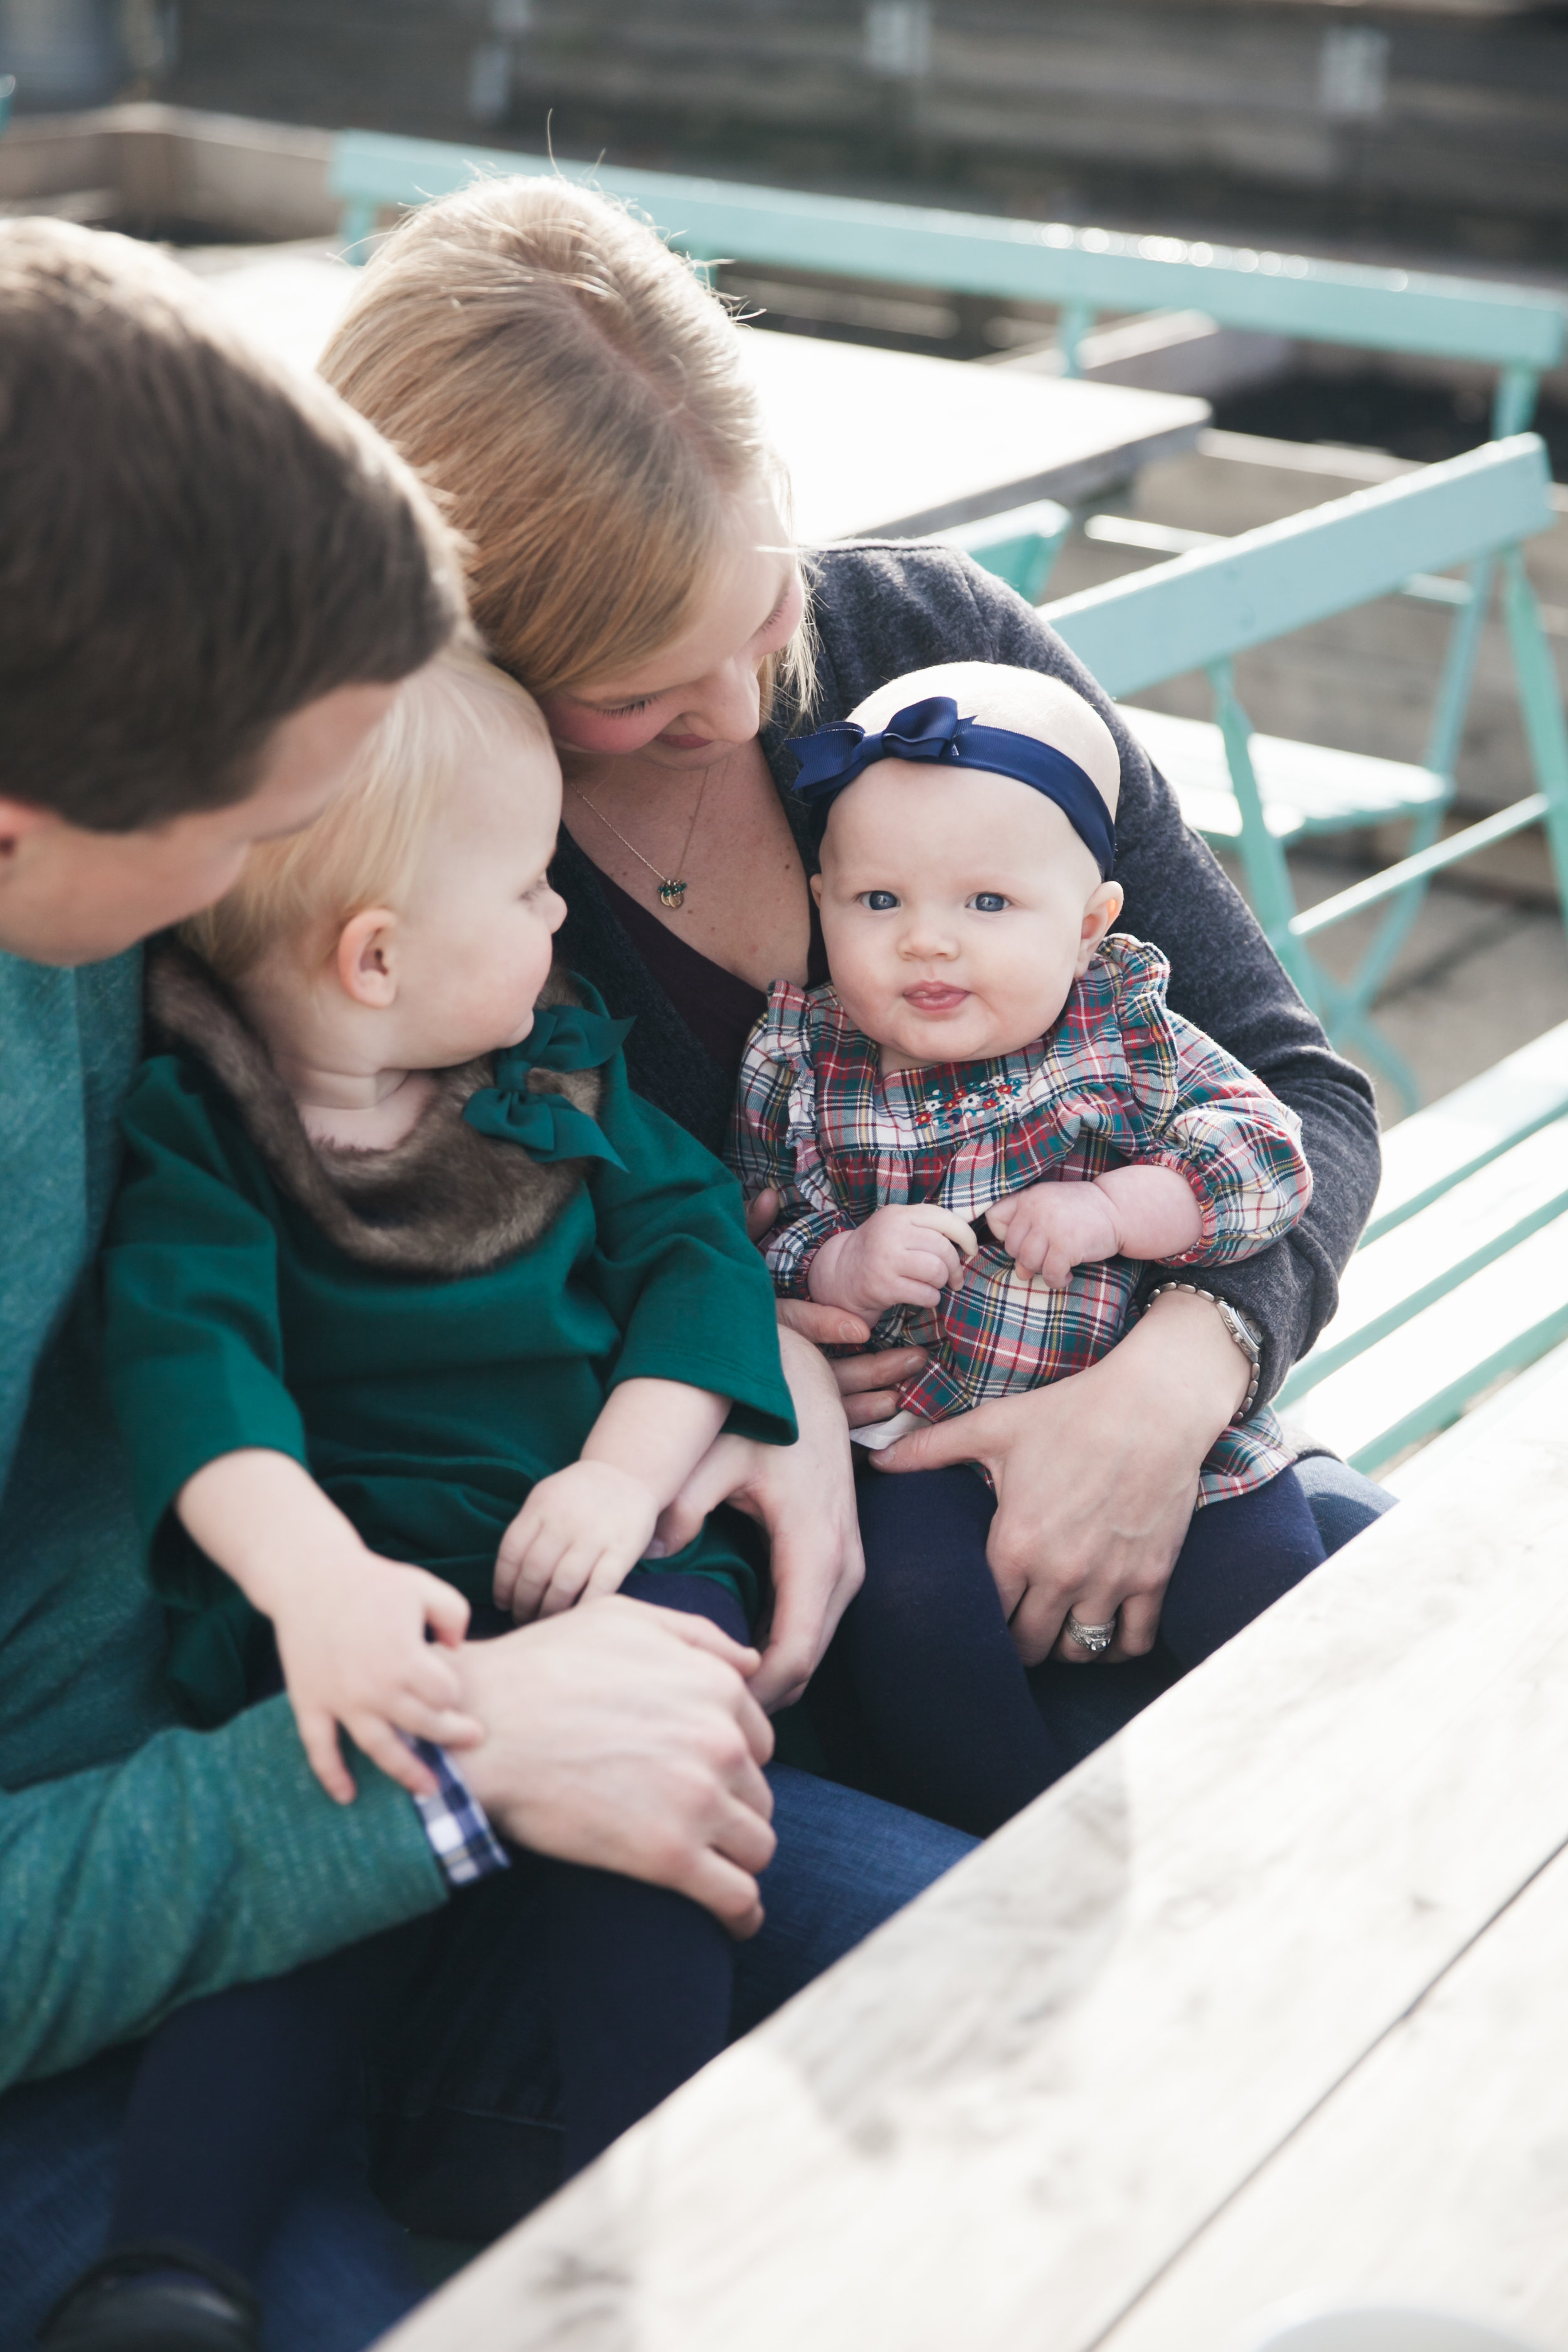 LisaDiederichPhotography_WhitmersChristmas_familyphotography-3.jpg